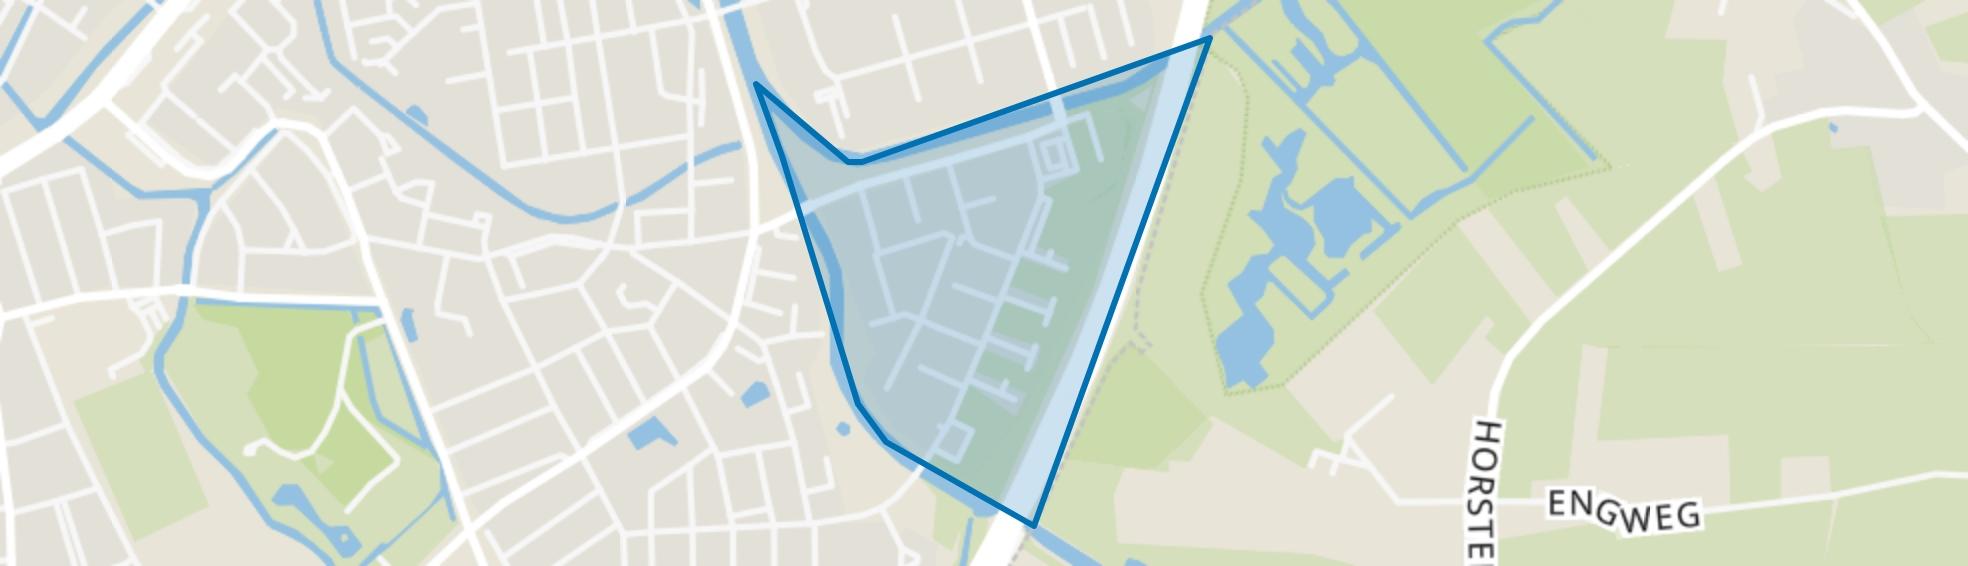 Verdiweg, Amersfoort map